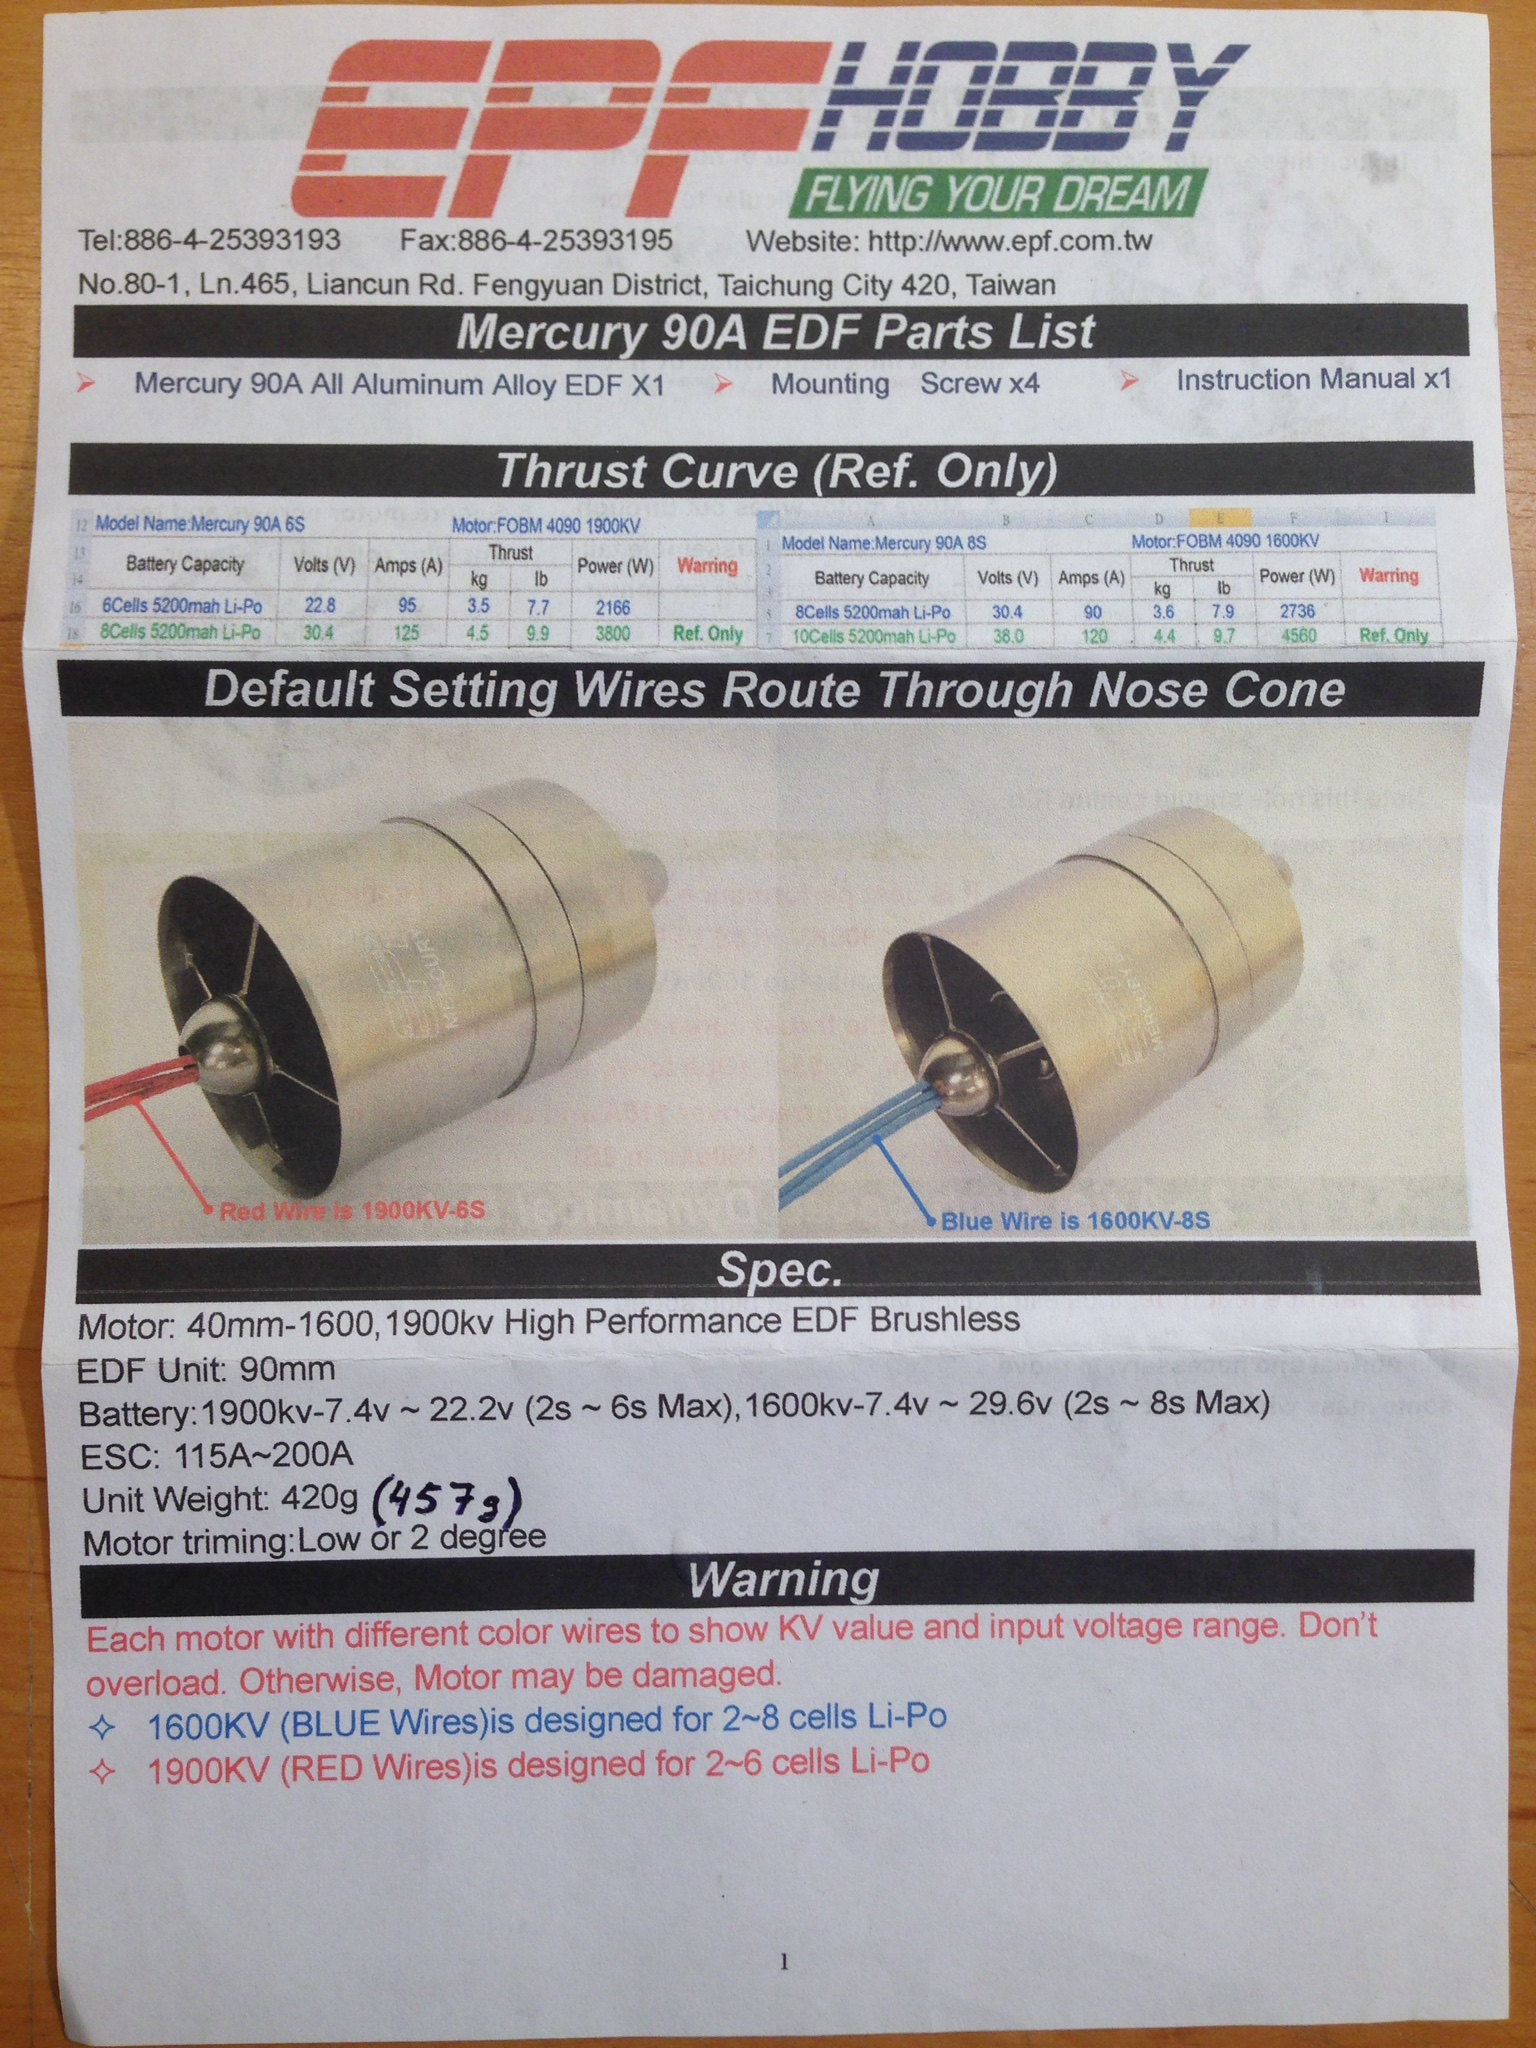 Mercury Alloy 12 Blade 90mm 1900kv EDF Unit (6s)